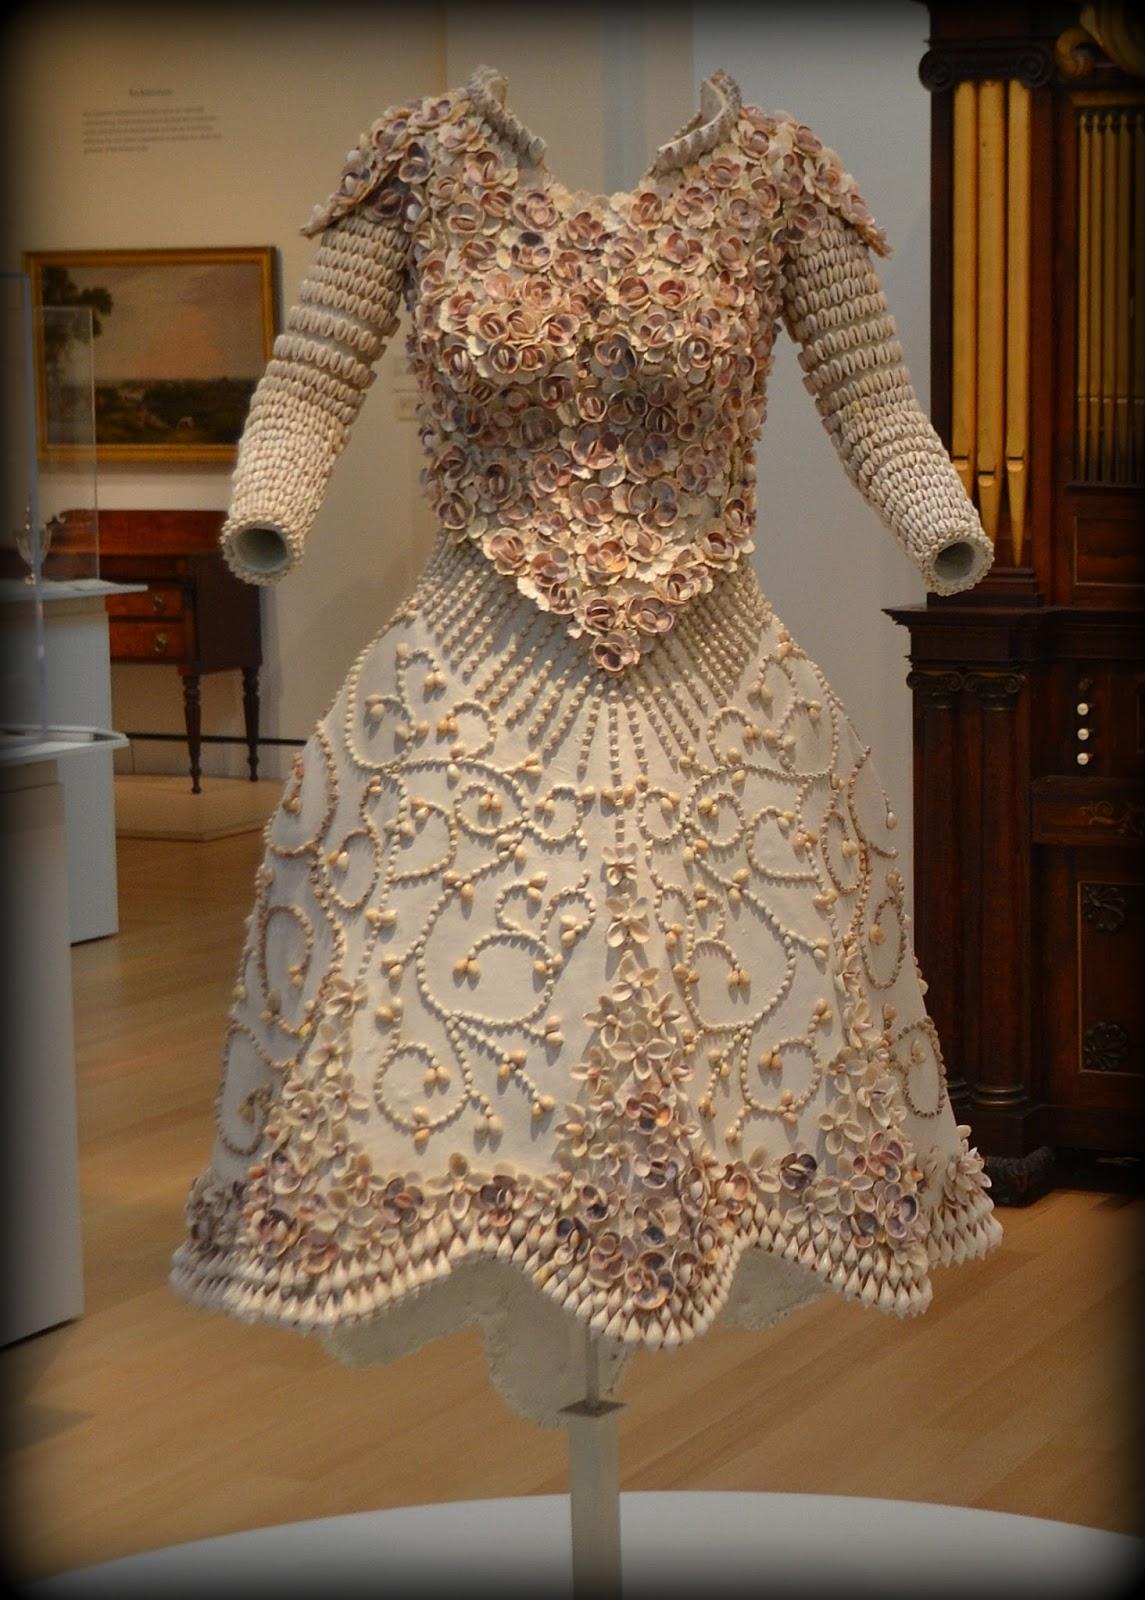 seashell, wedding, dress, peabody essex museum, pem, clothing